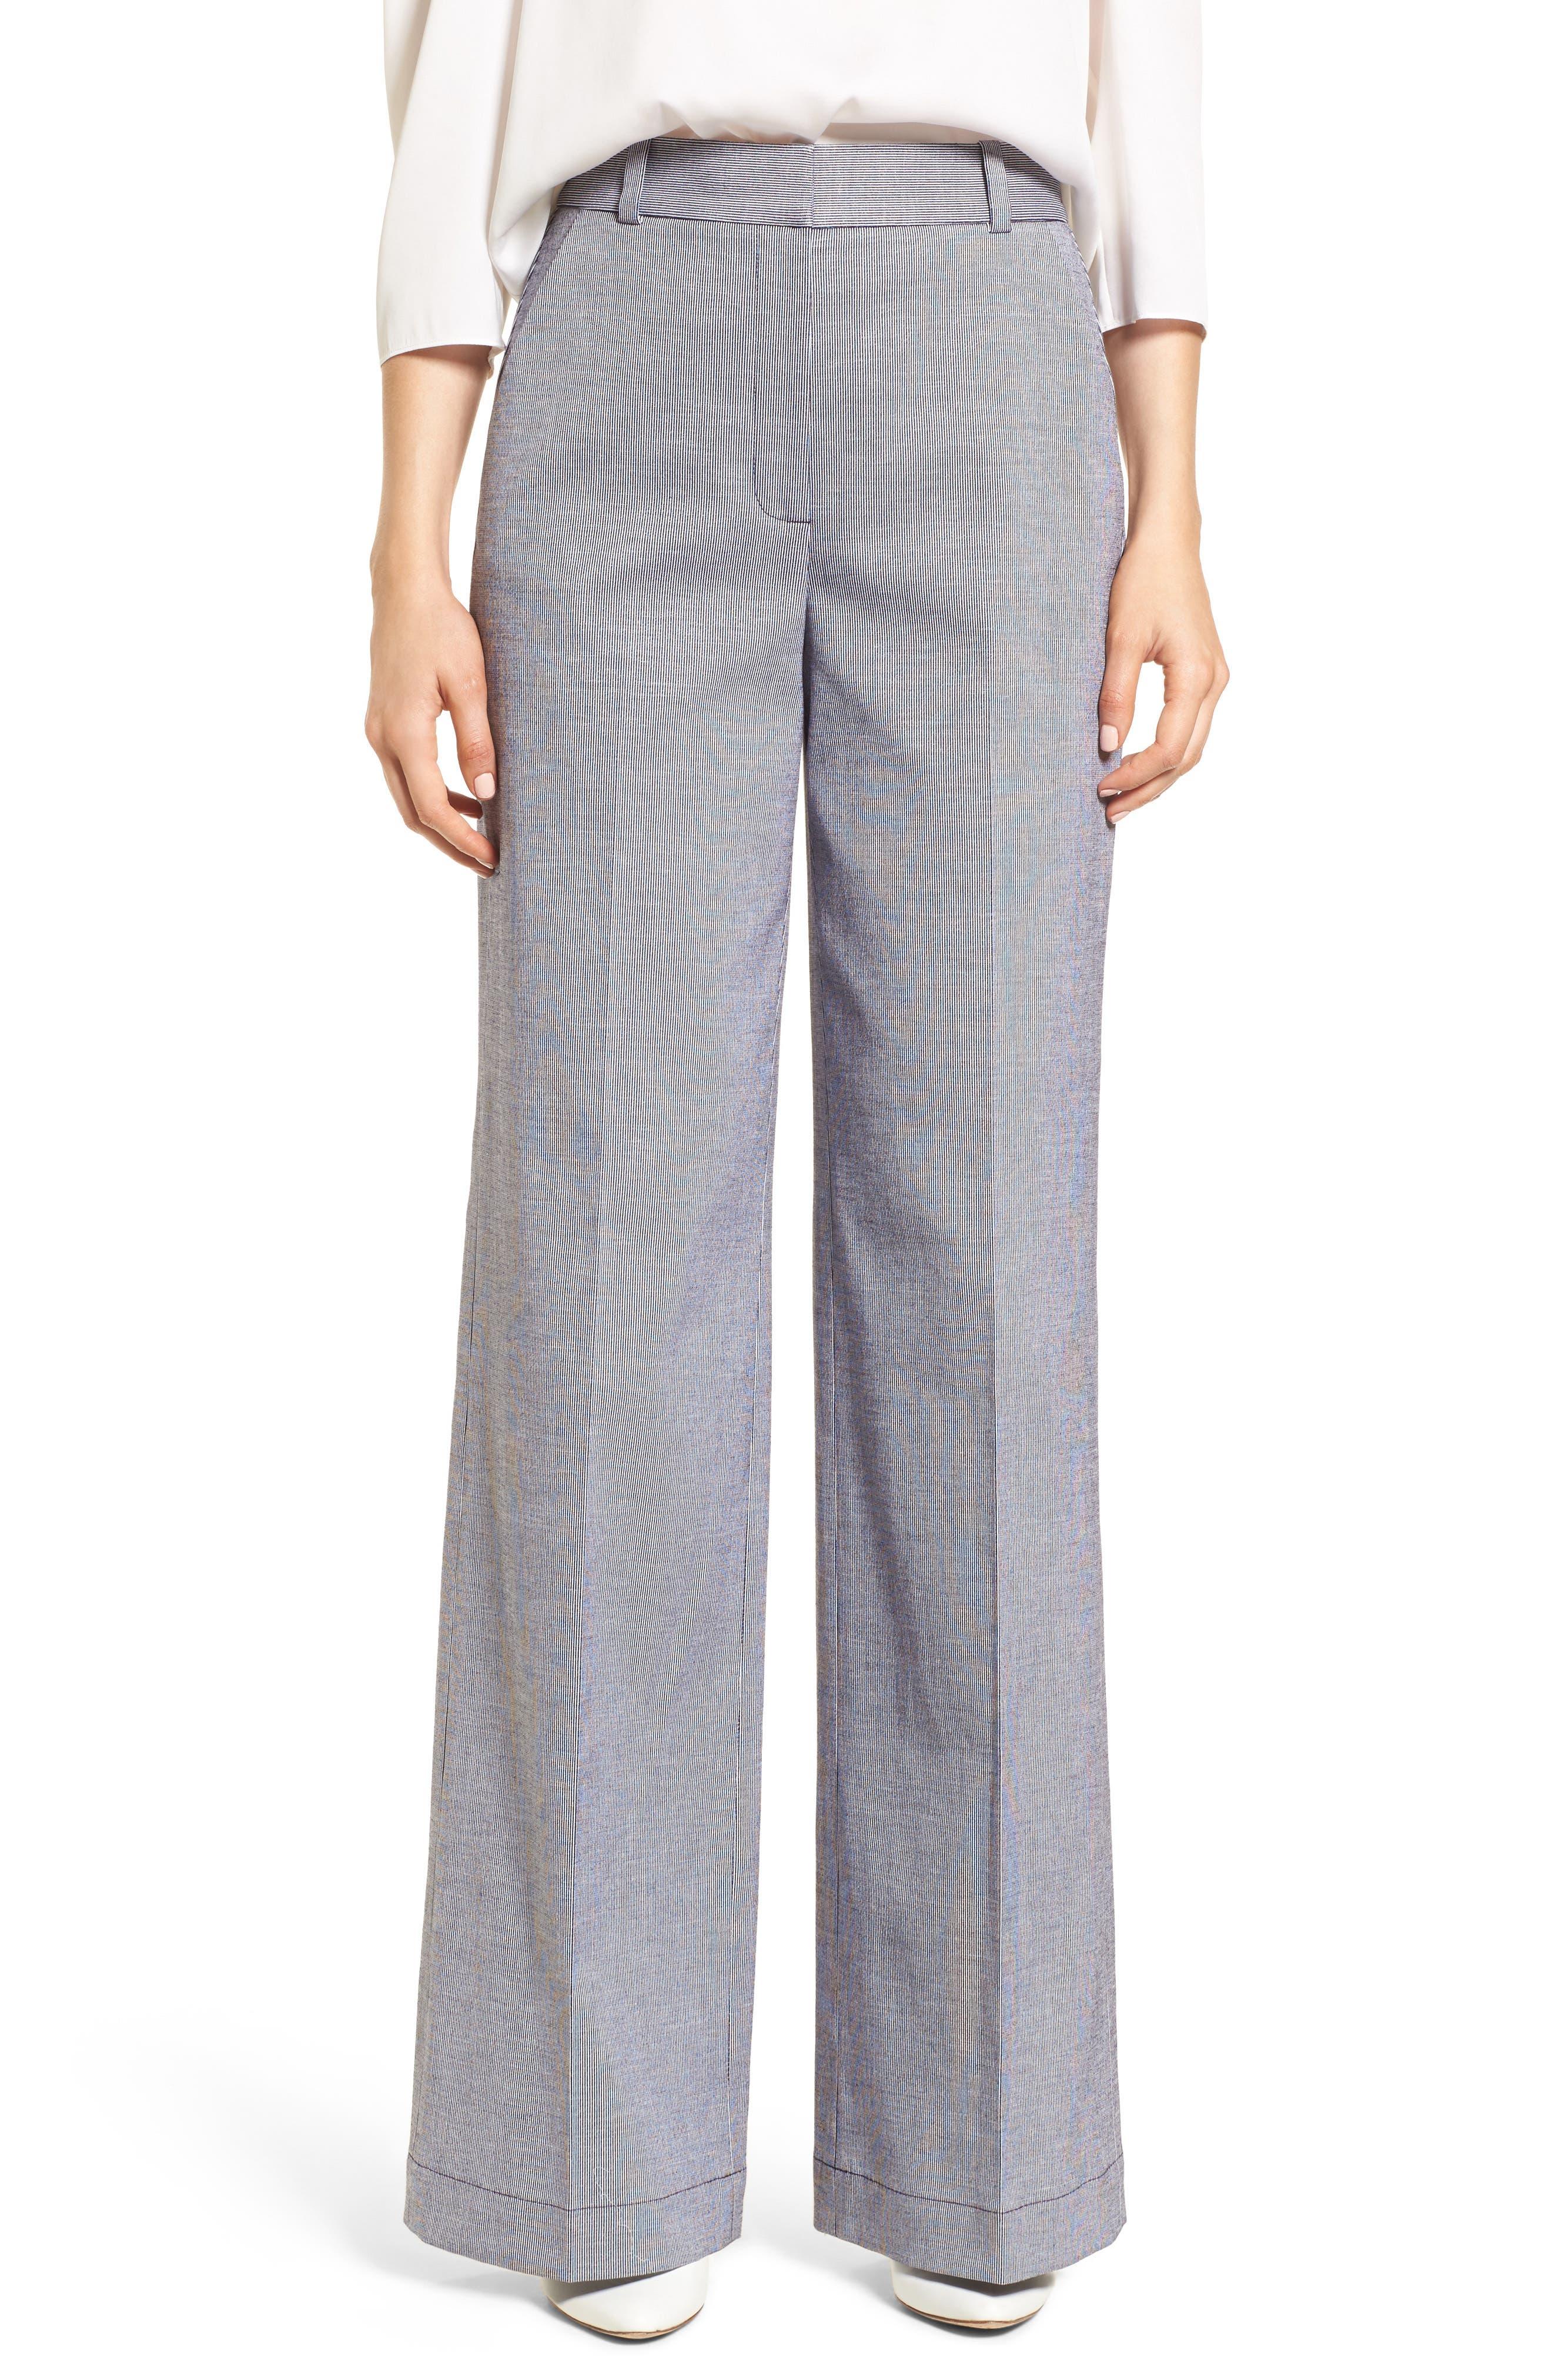 Ticking Stripe Pants,                             Main thumbnail 1, color,                             401